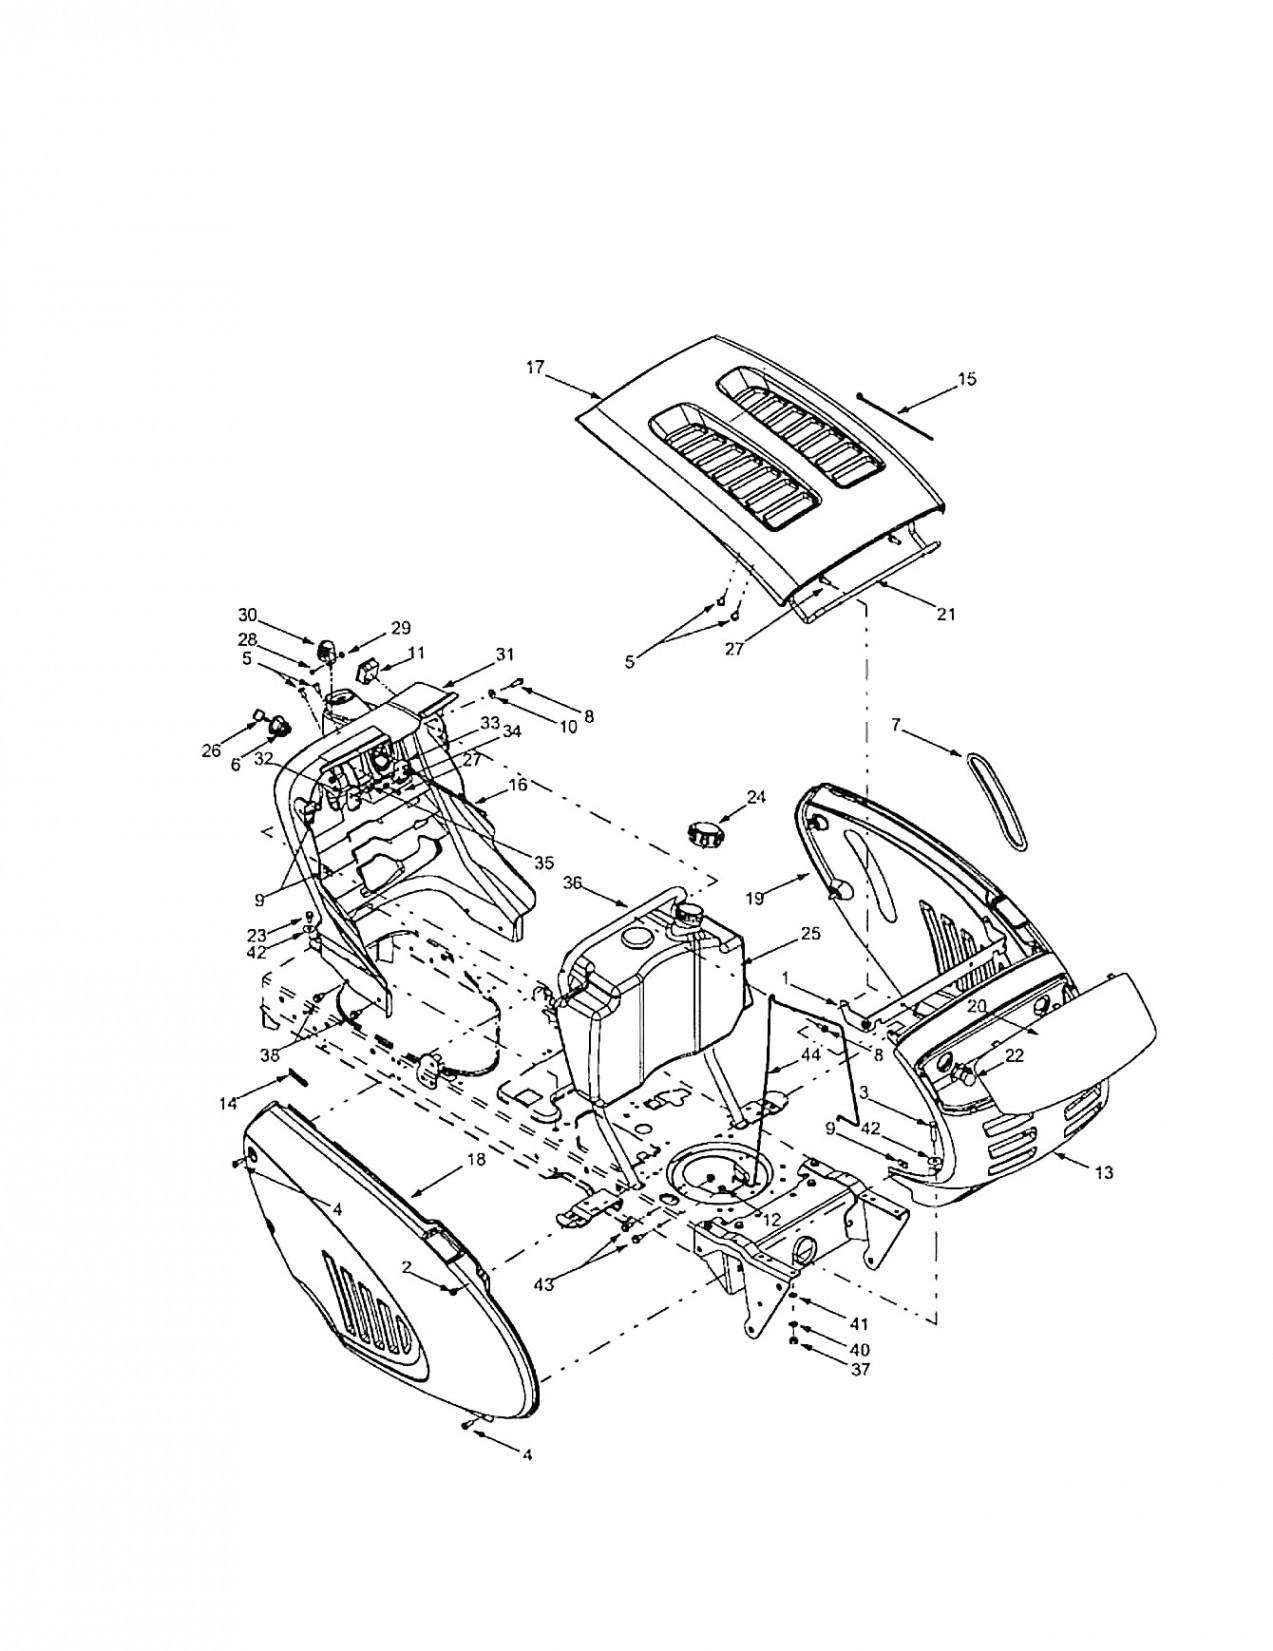 troy bilt lawn mower engine diagram troy bilt bronco riding mower wiring  diagram manual wiring of